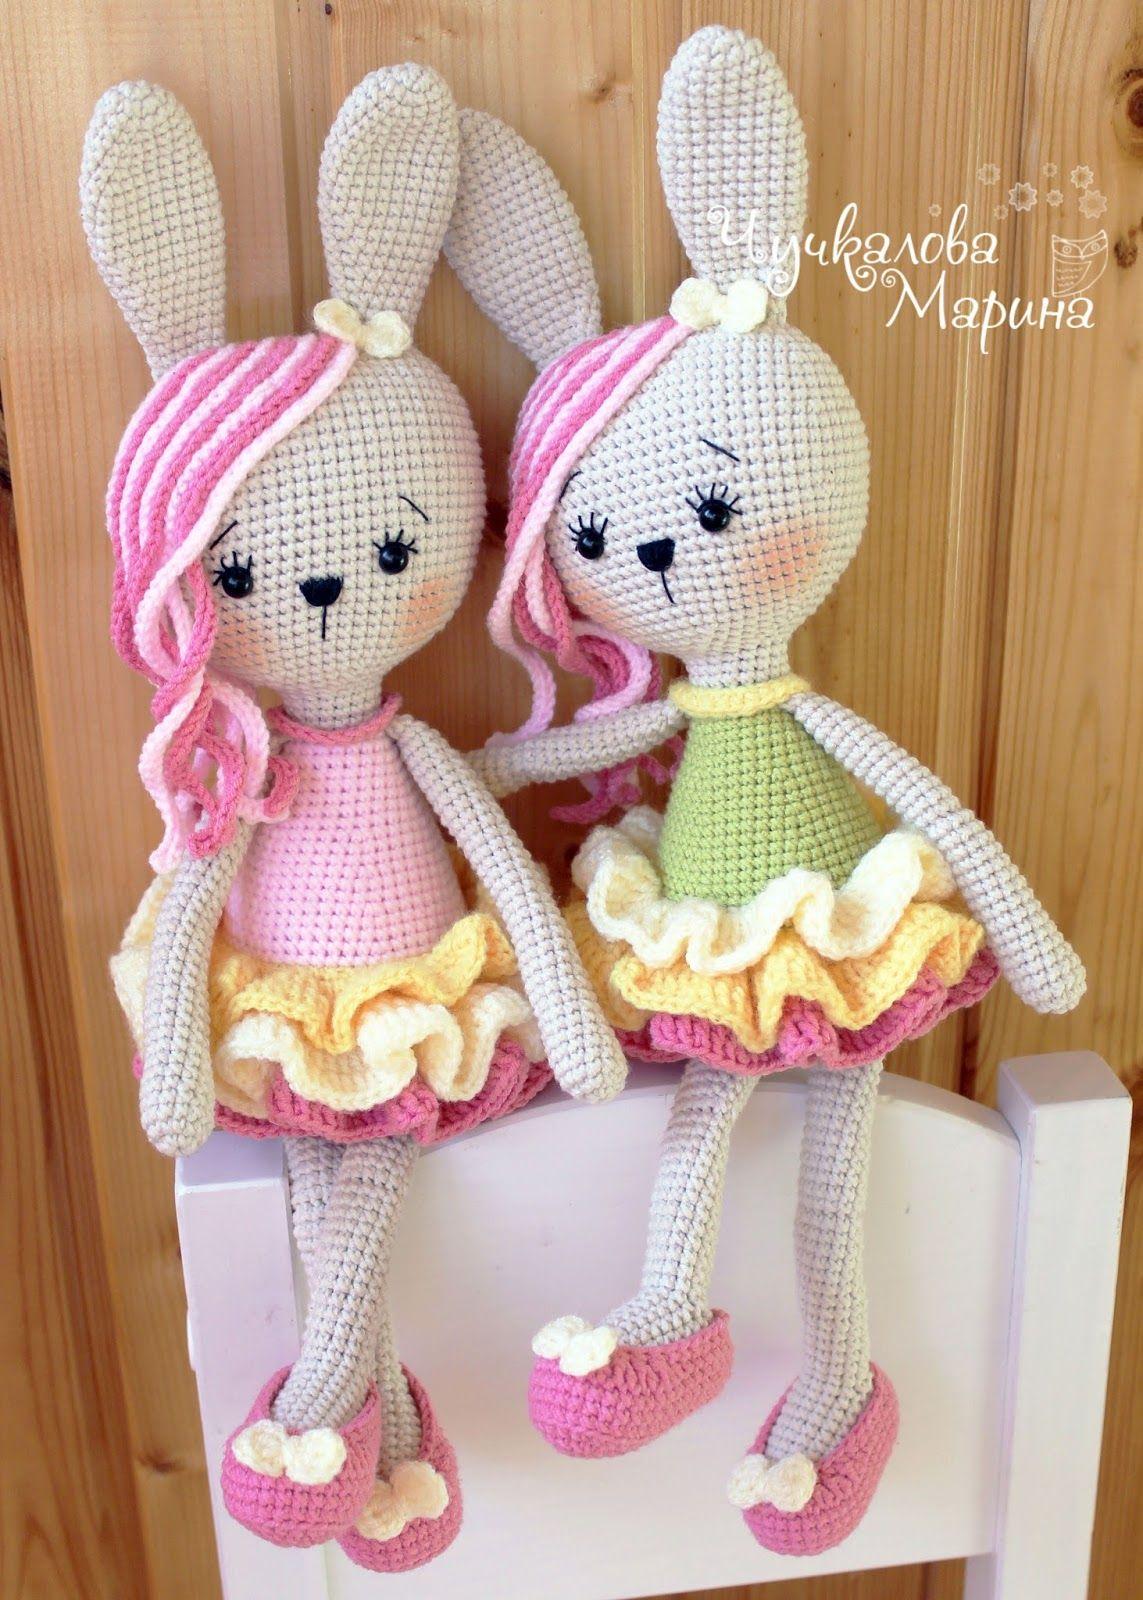 Pin by Netta Ishay on bunny | Pinterest | Amigurumi, Crochet and ...